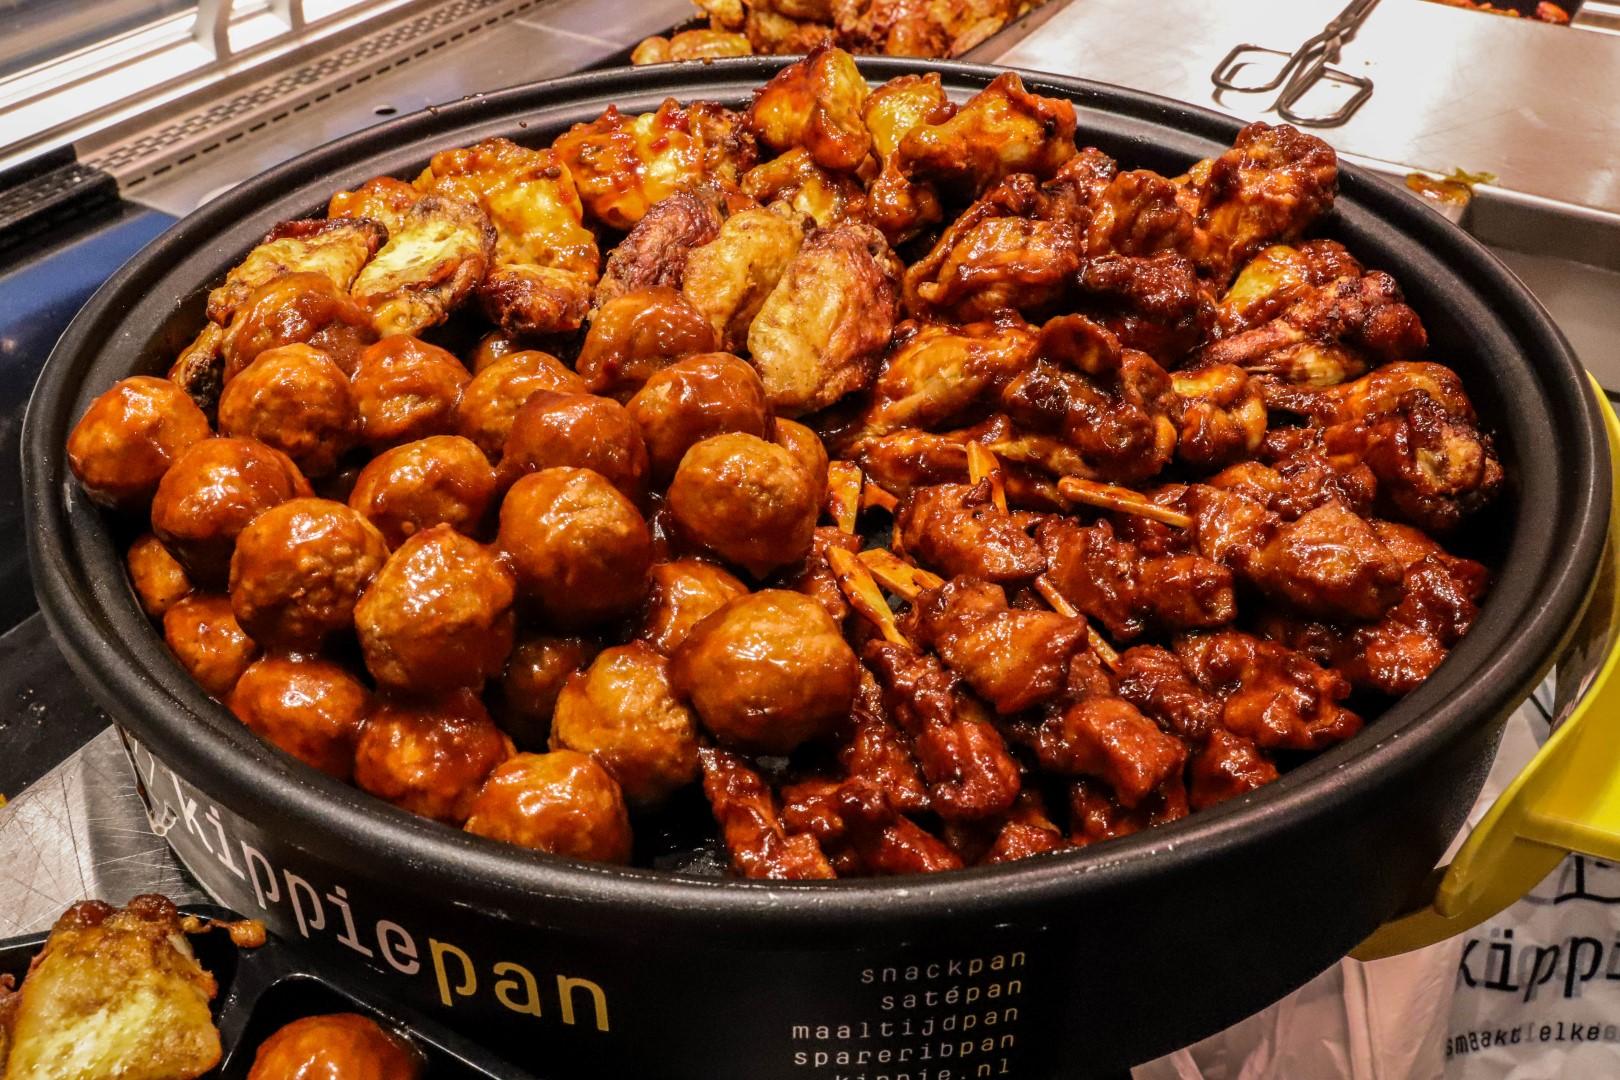 kippie maaltijden grill kip kippiepan